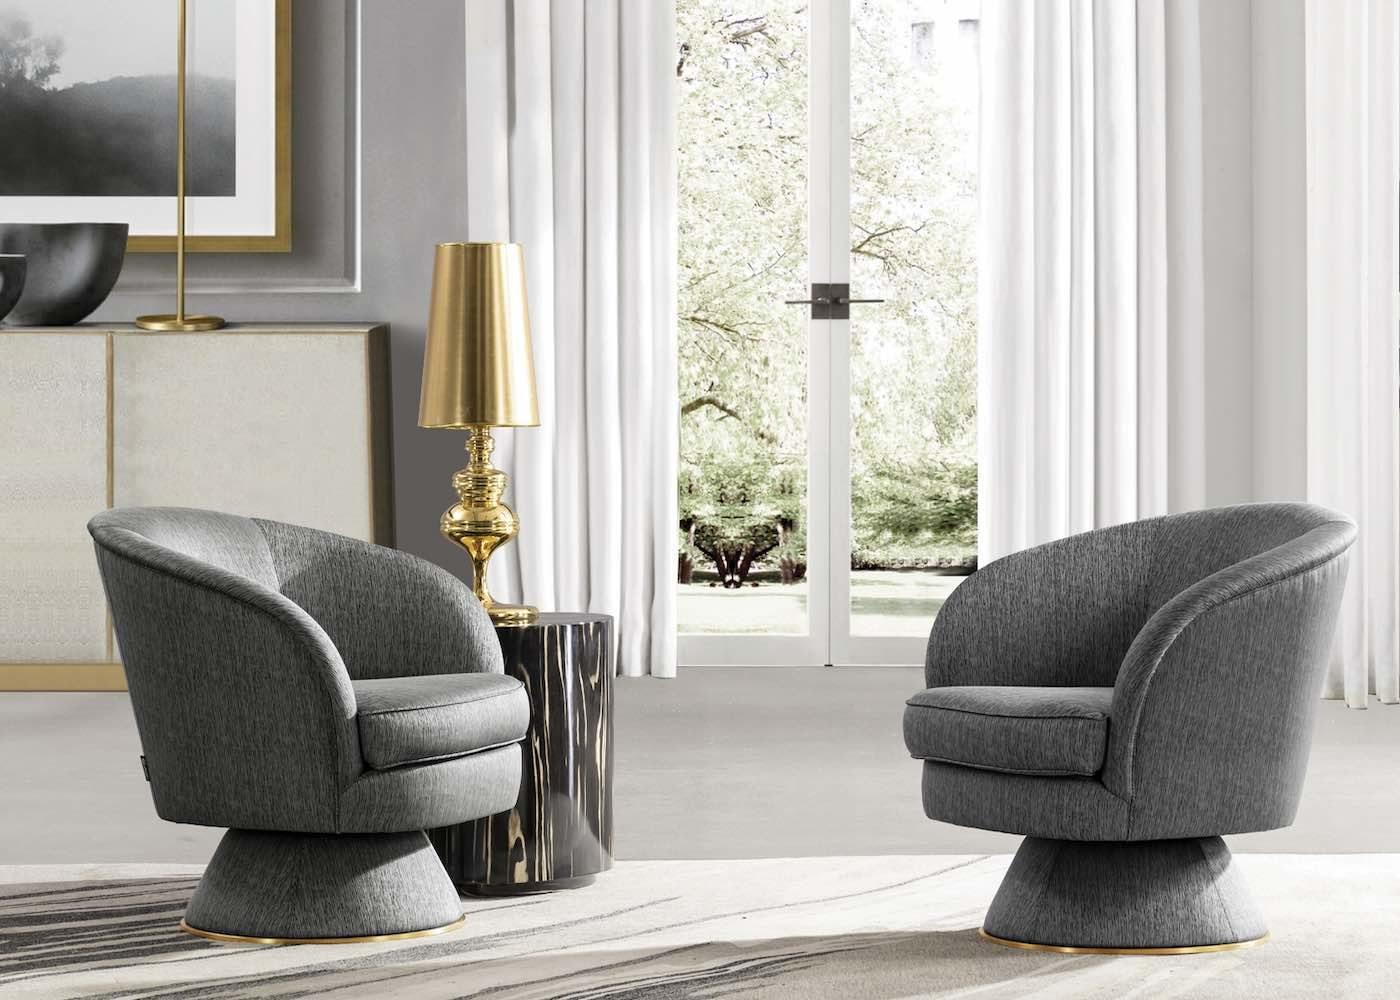 mazarin-ameublement-catalogue-produits-chaise-fauteuil-31